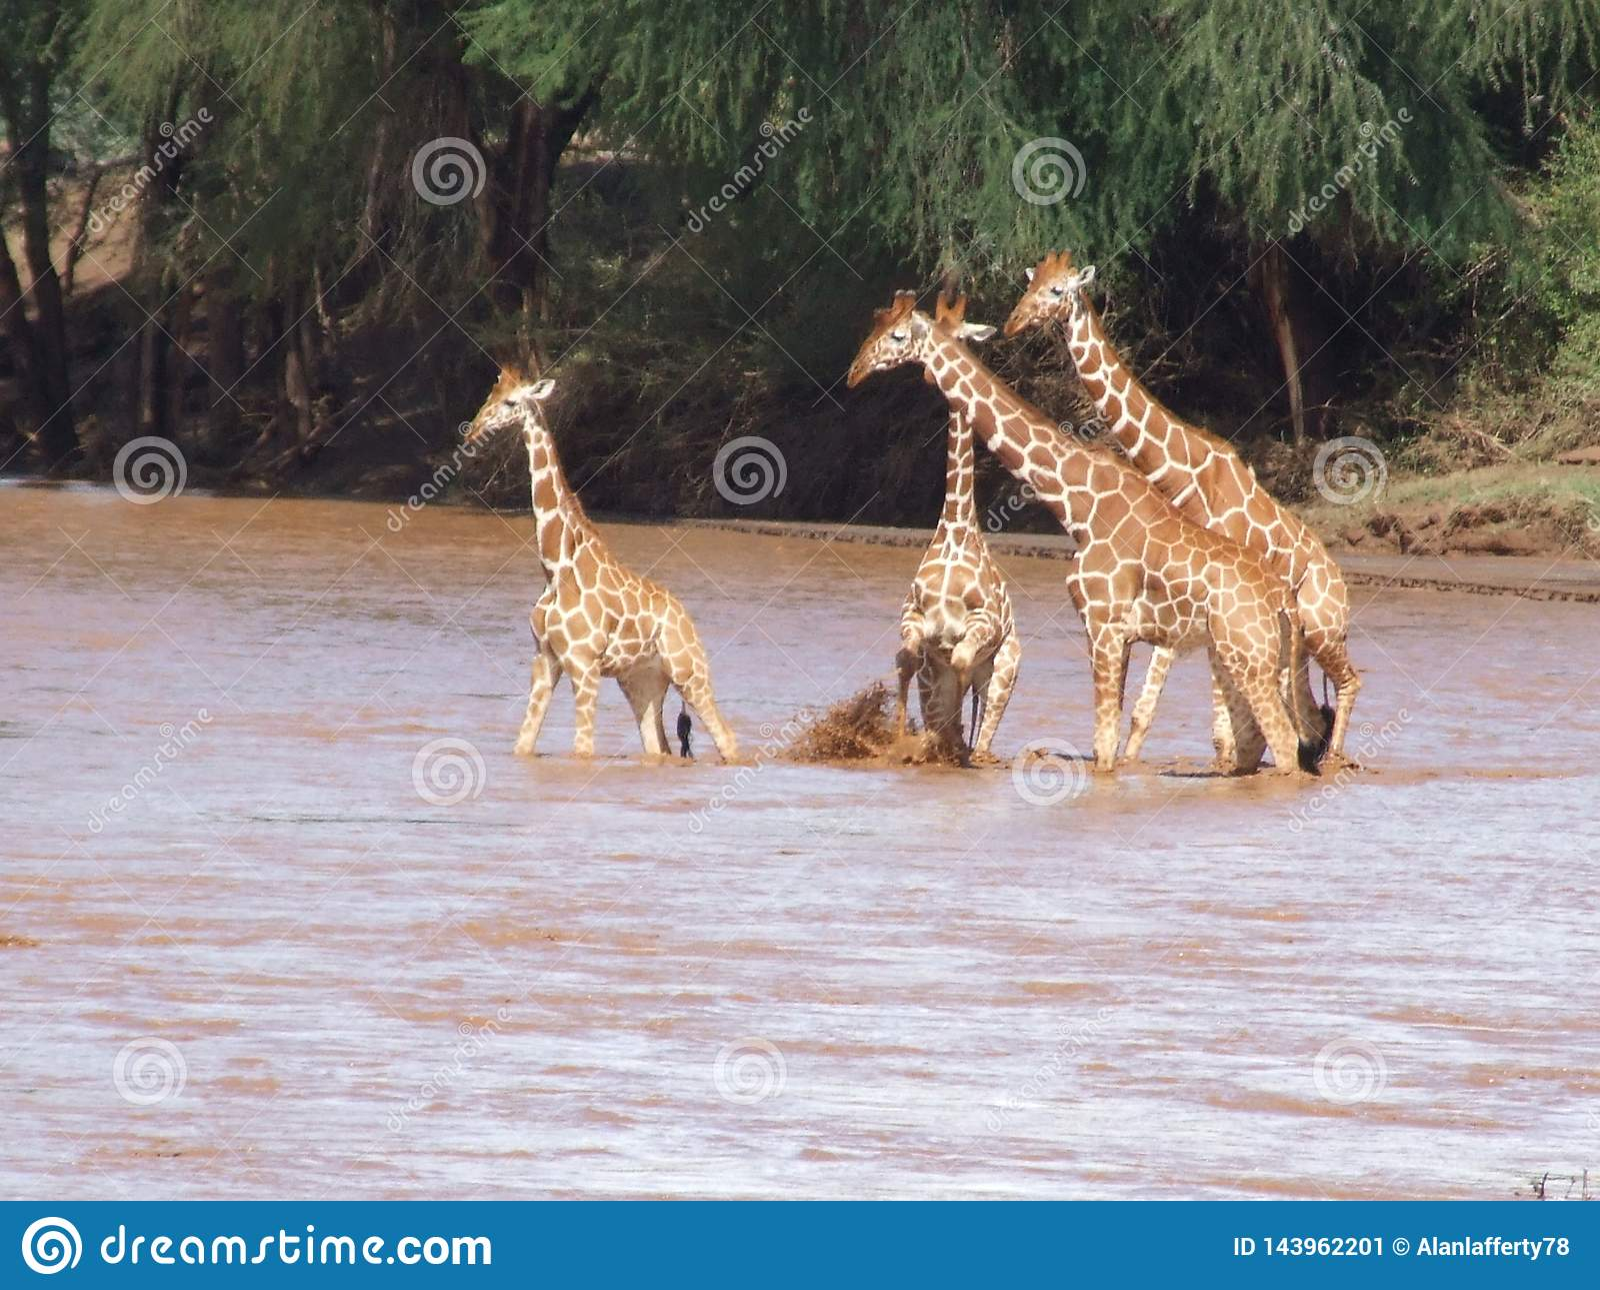 Various animals in africa on safari in kenya